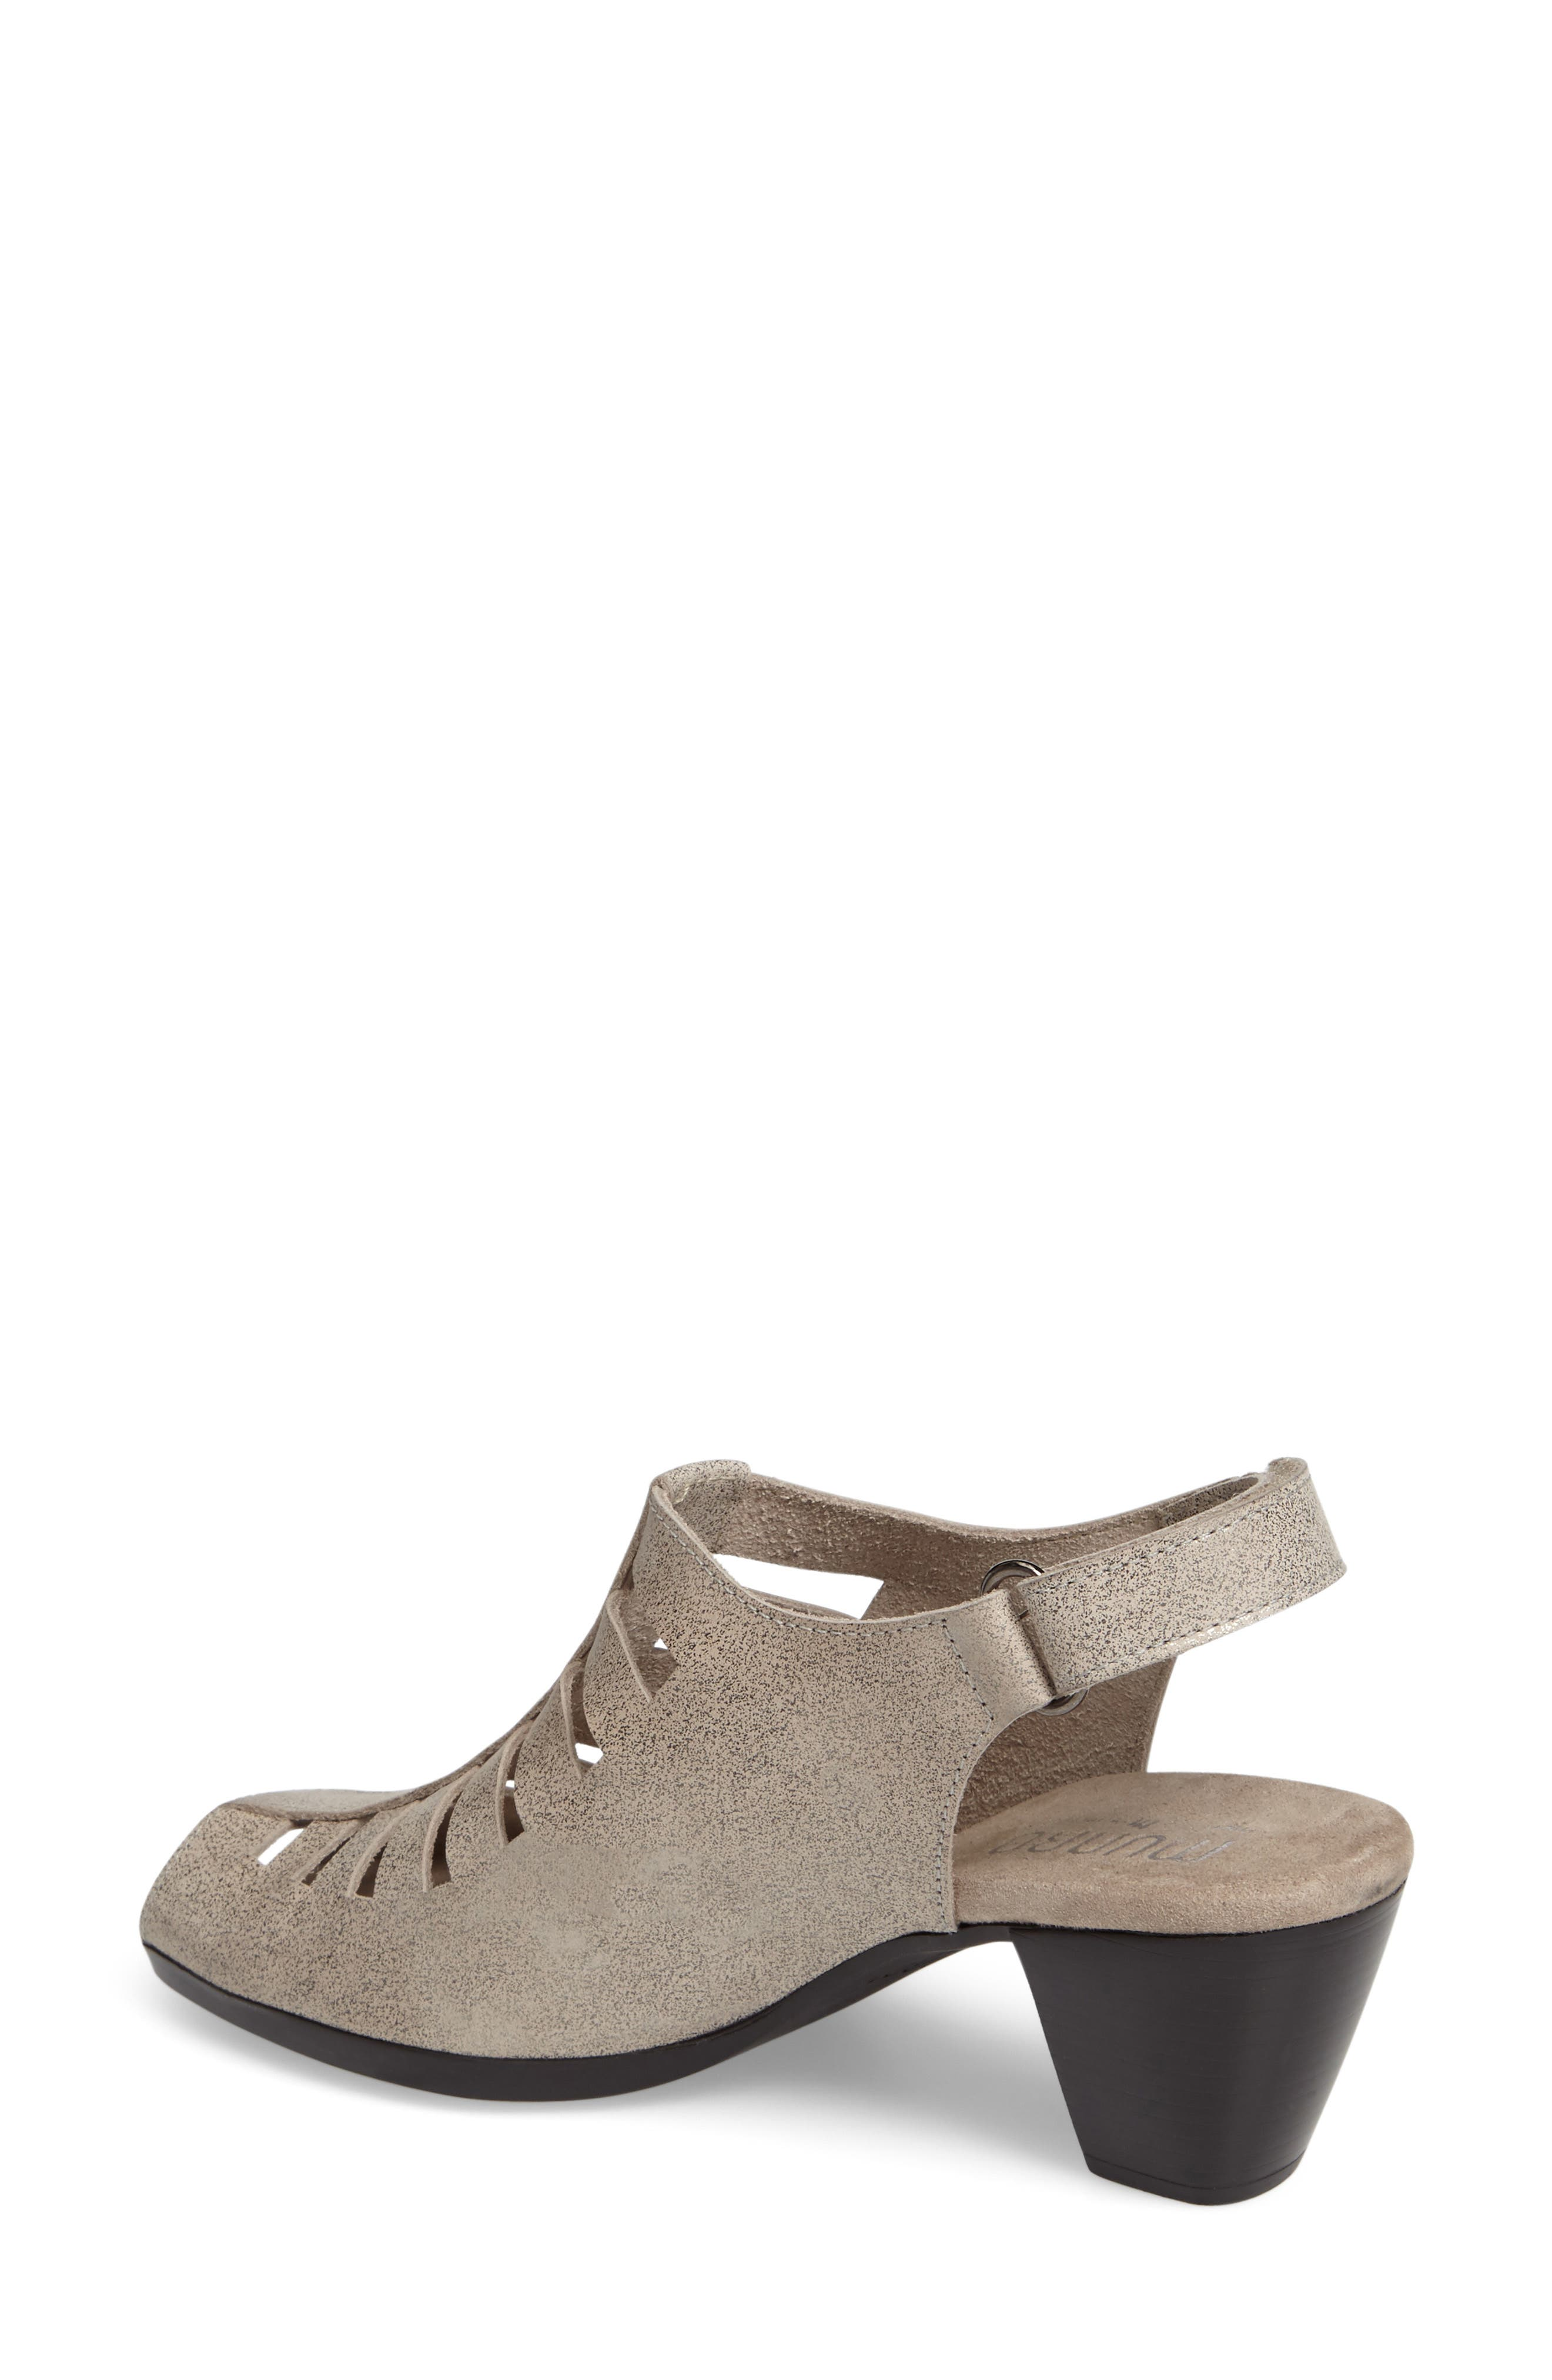 'Abby' Slingback Sandal,                             Alternate thumbnail 2, color,                             Silver Metallic